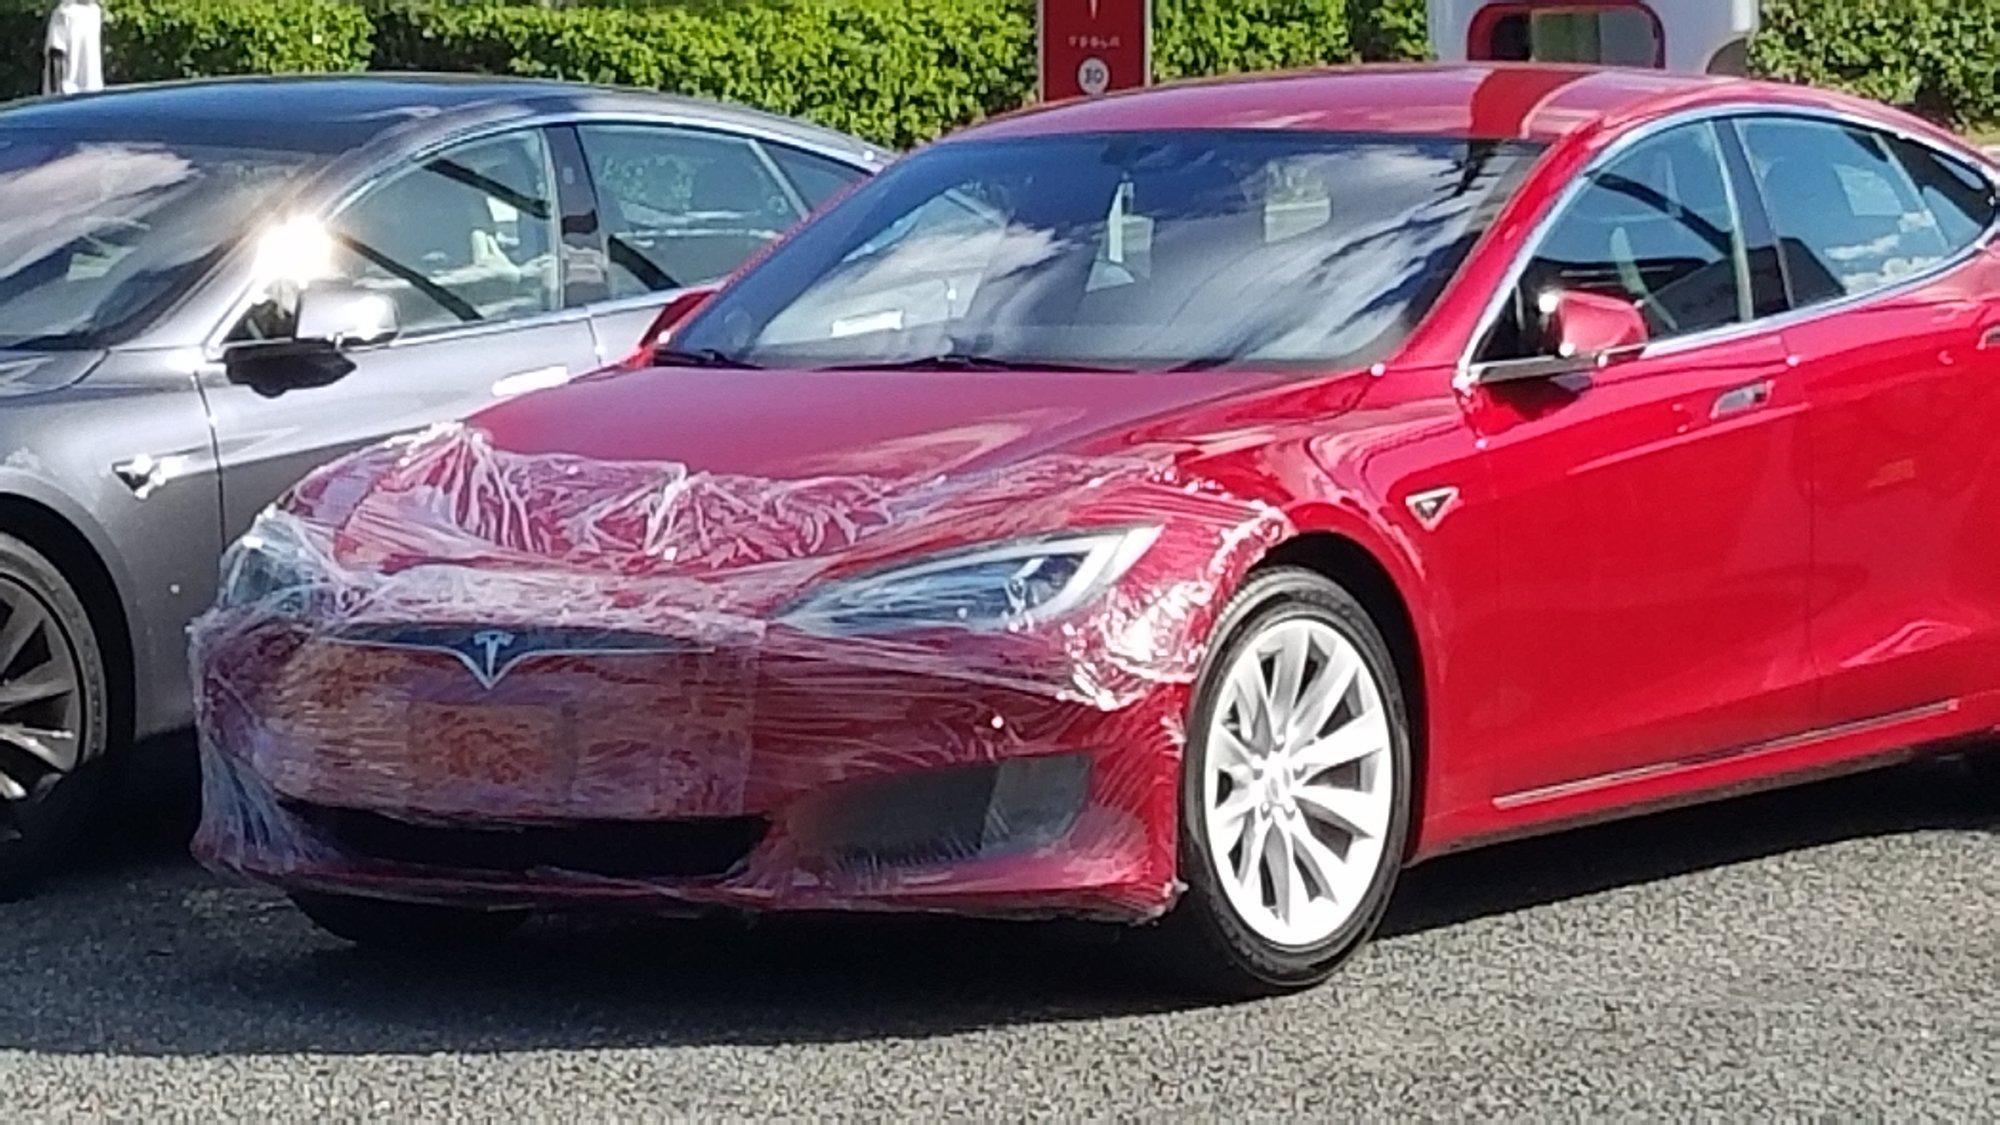 Tesla Model S with BAD WRAP.jpg